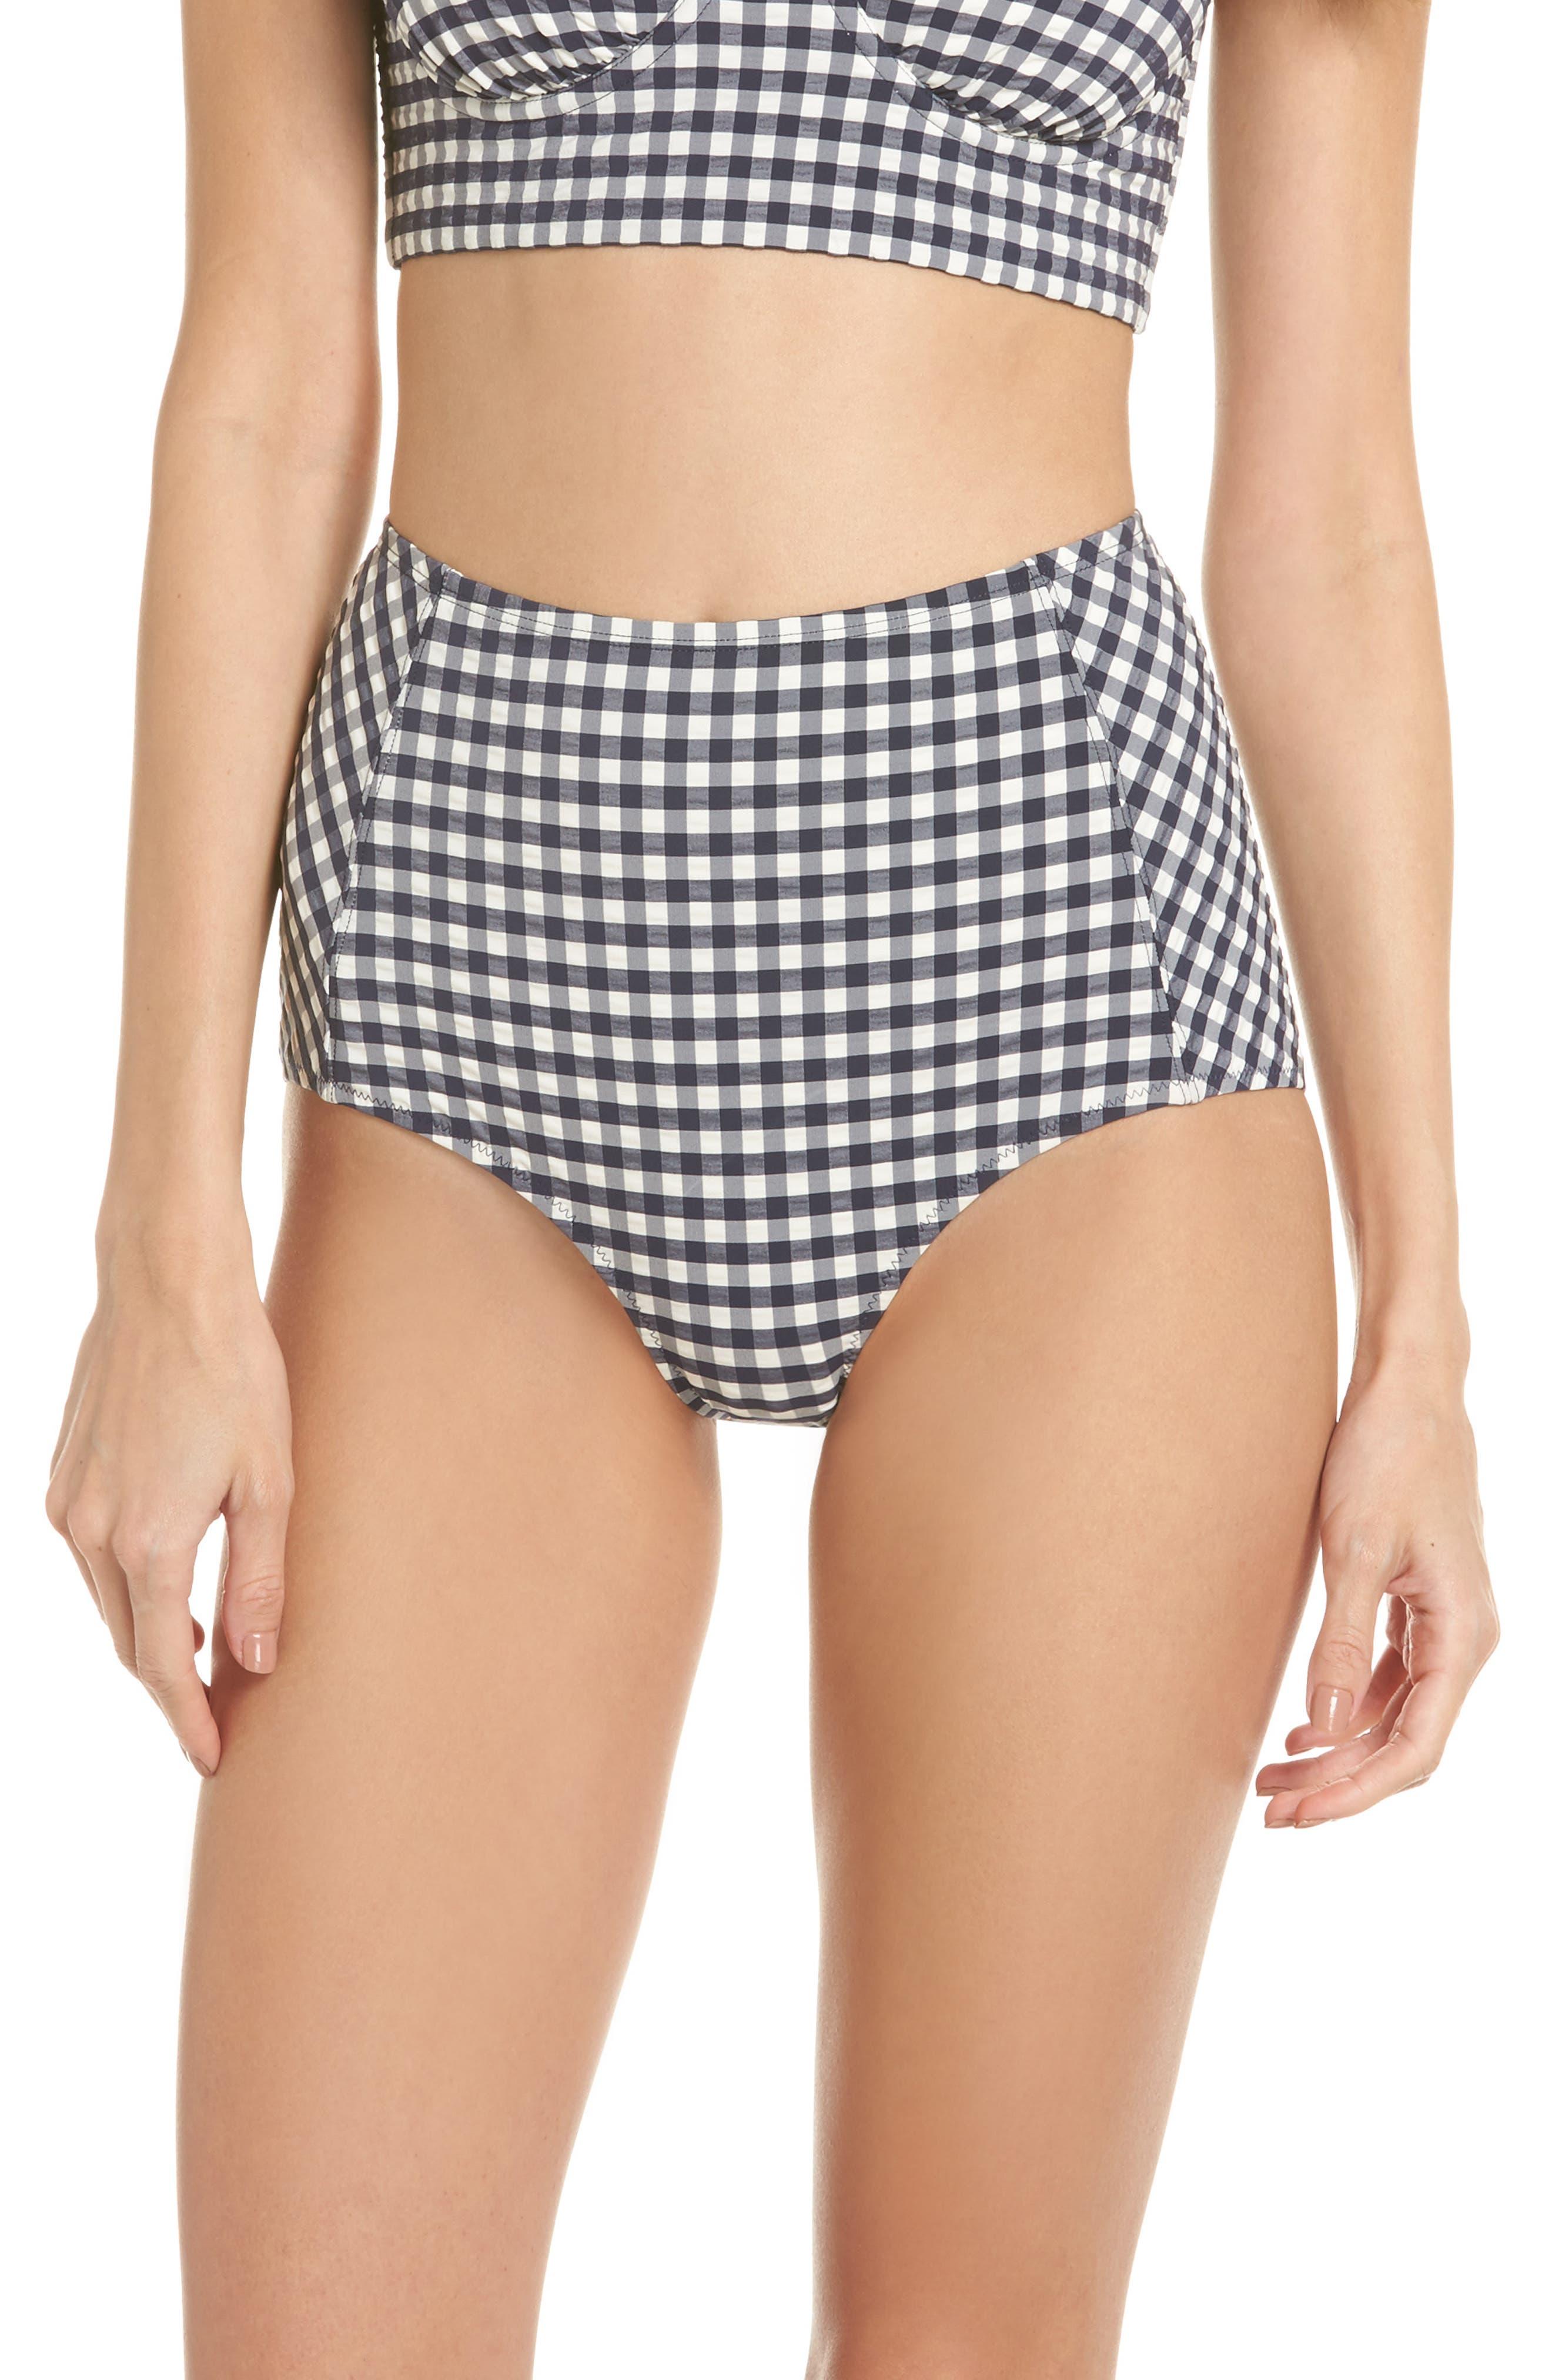 Gingham High Waist Bikini Bottoms,                             Main thumbnail 1, color,                             Tory Navy / White